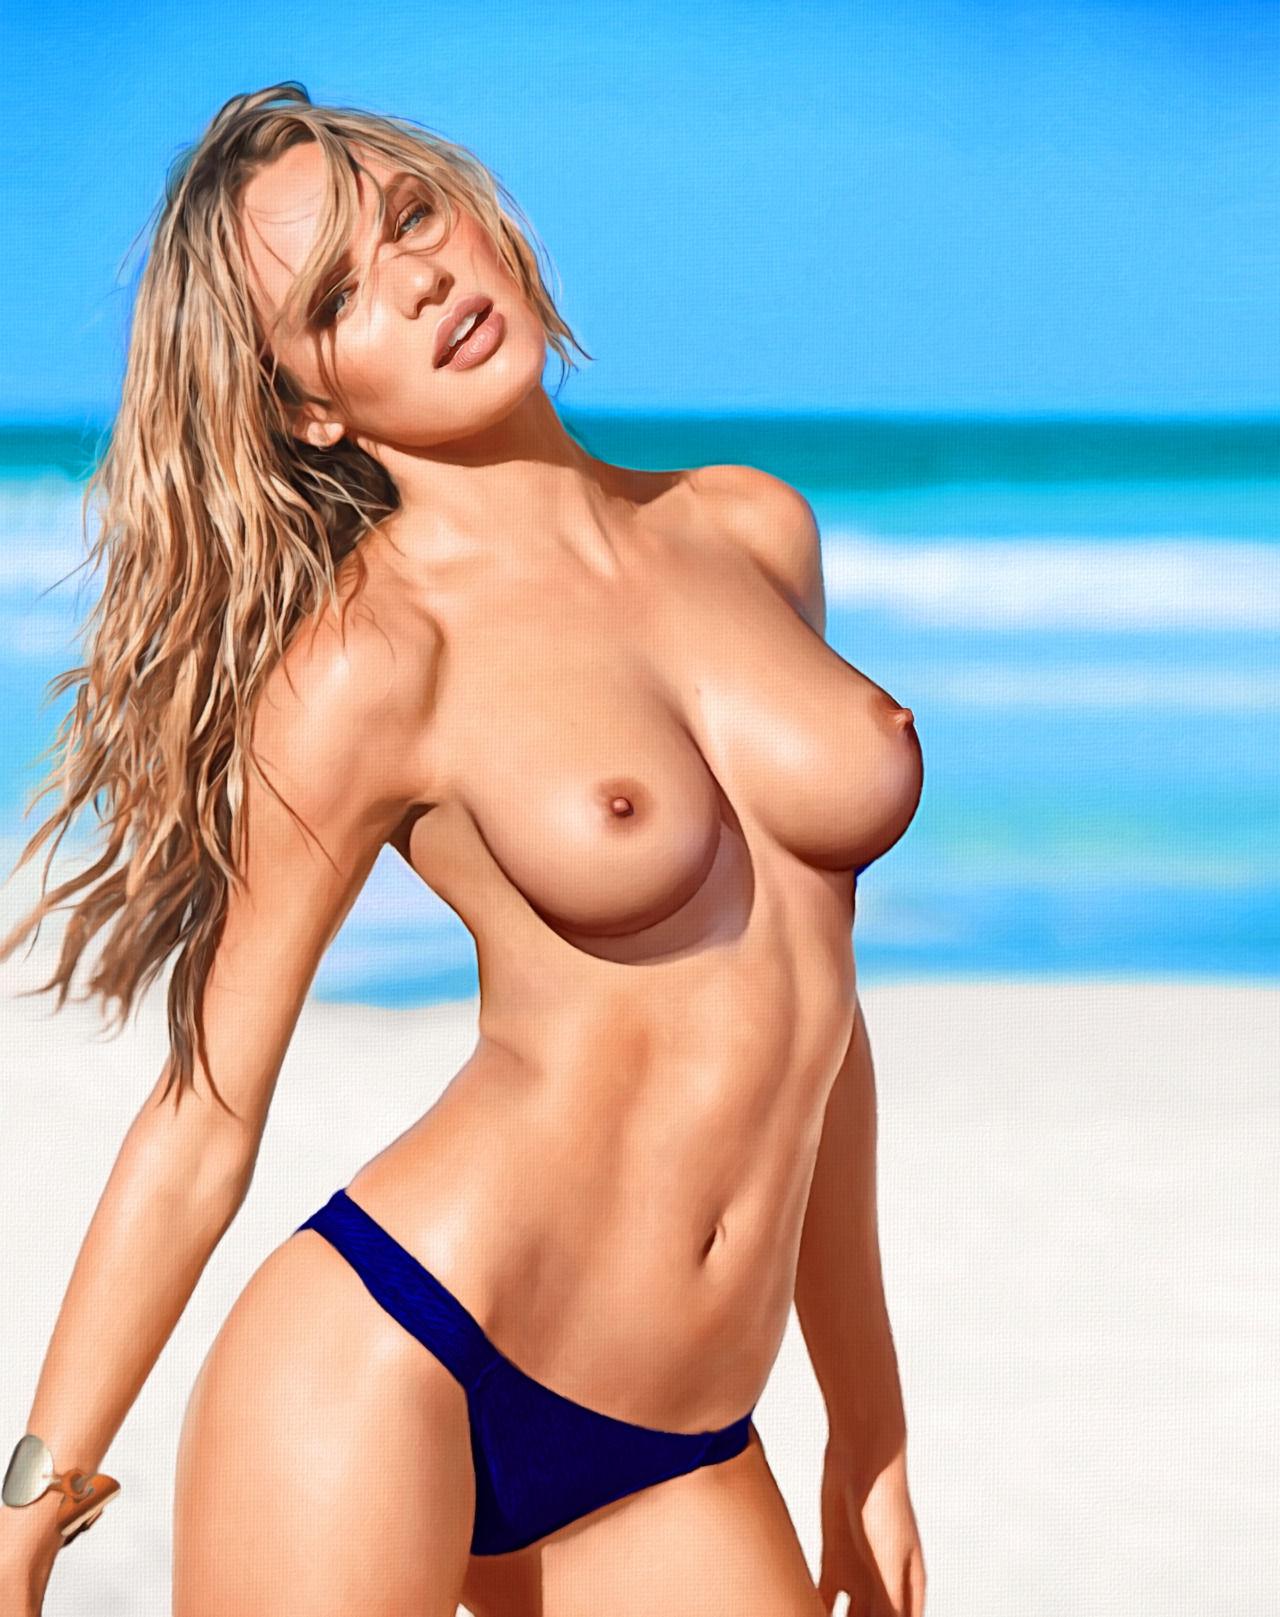 Hayden panettiere desnuda porno opinion